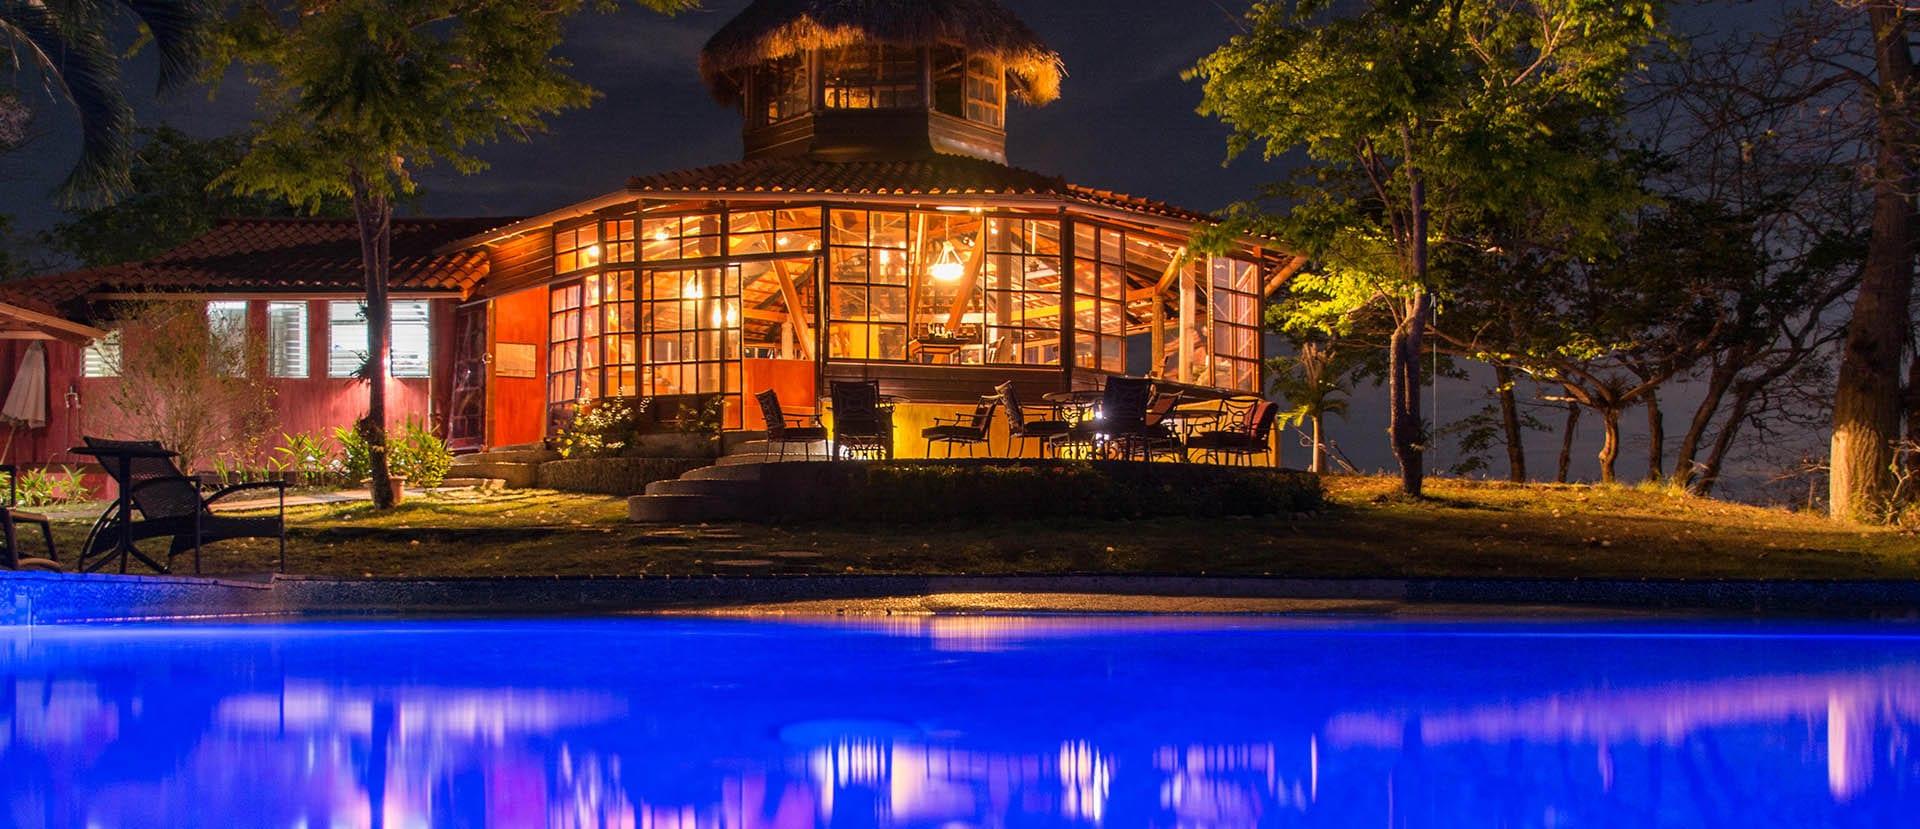 oceanside panama restaurant